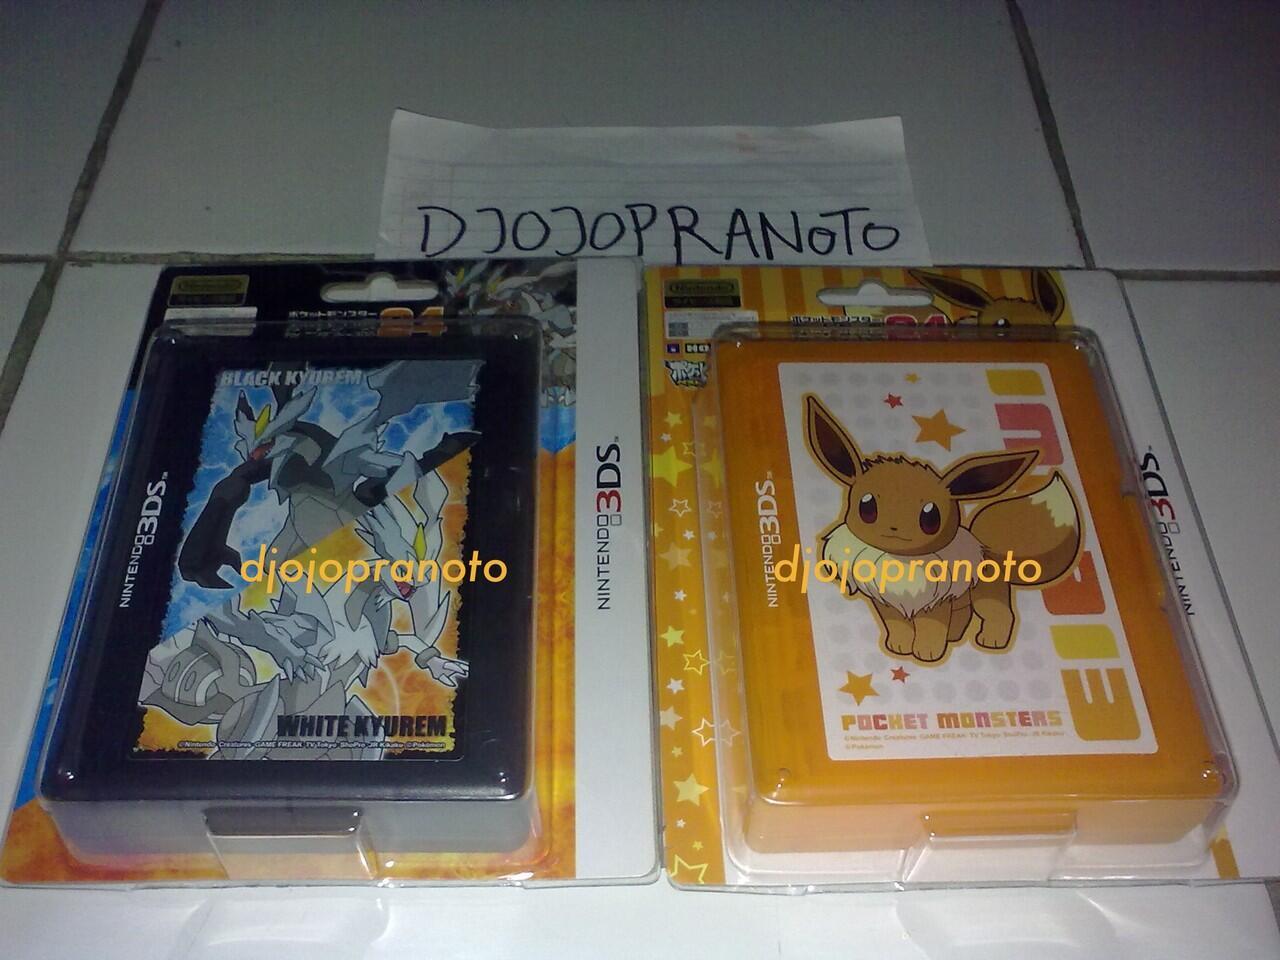 3DS Pokemon Game Cards Case 24 Limited Banget (Kotak Taruh Kaset 3DS Pokemon)